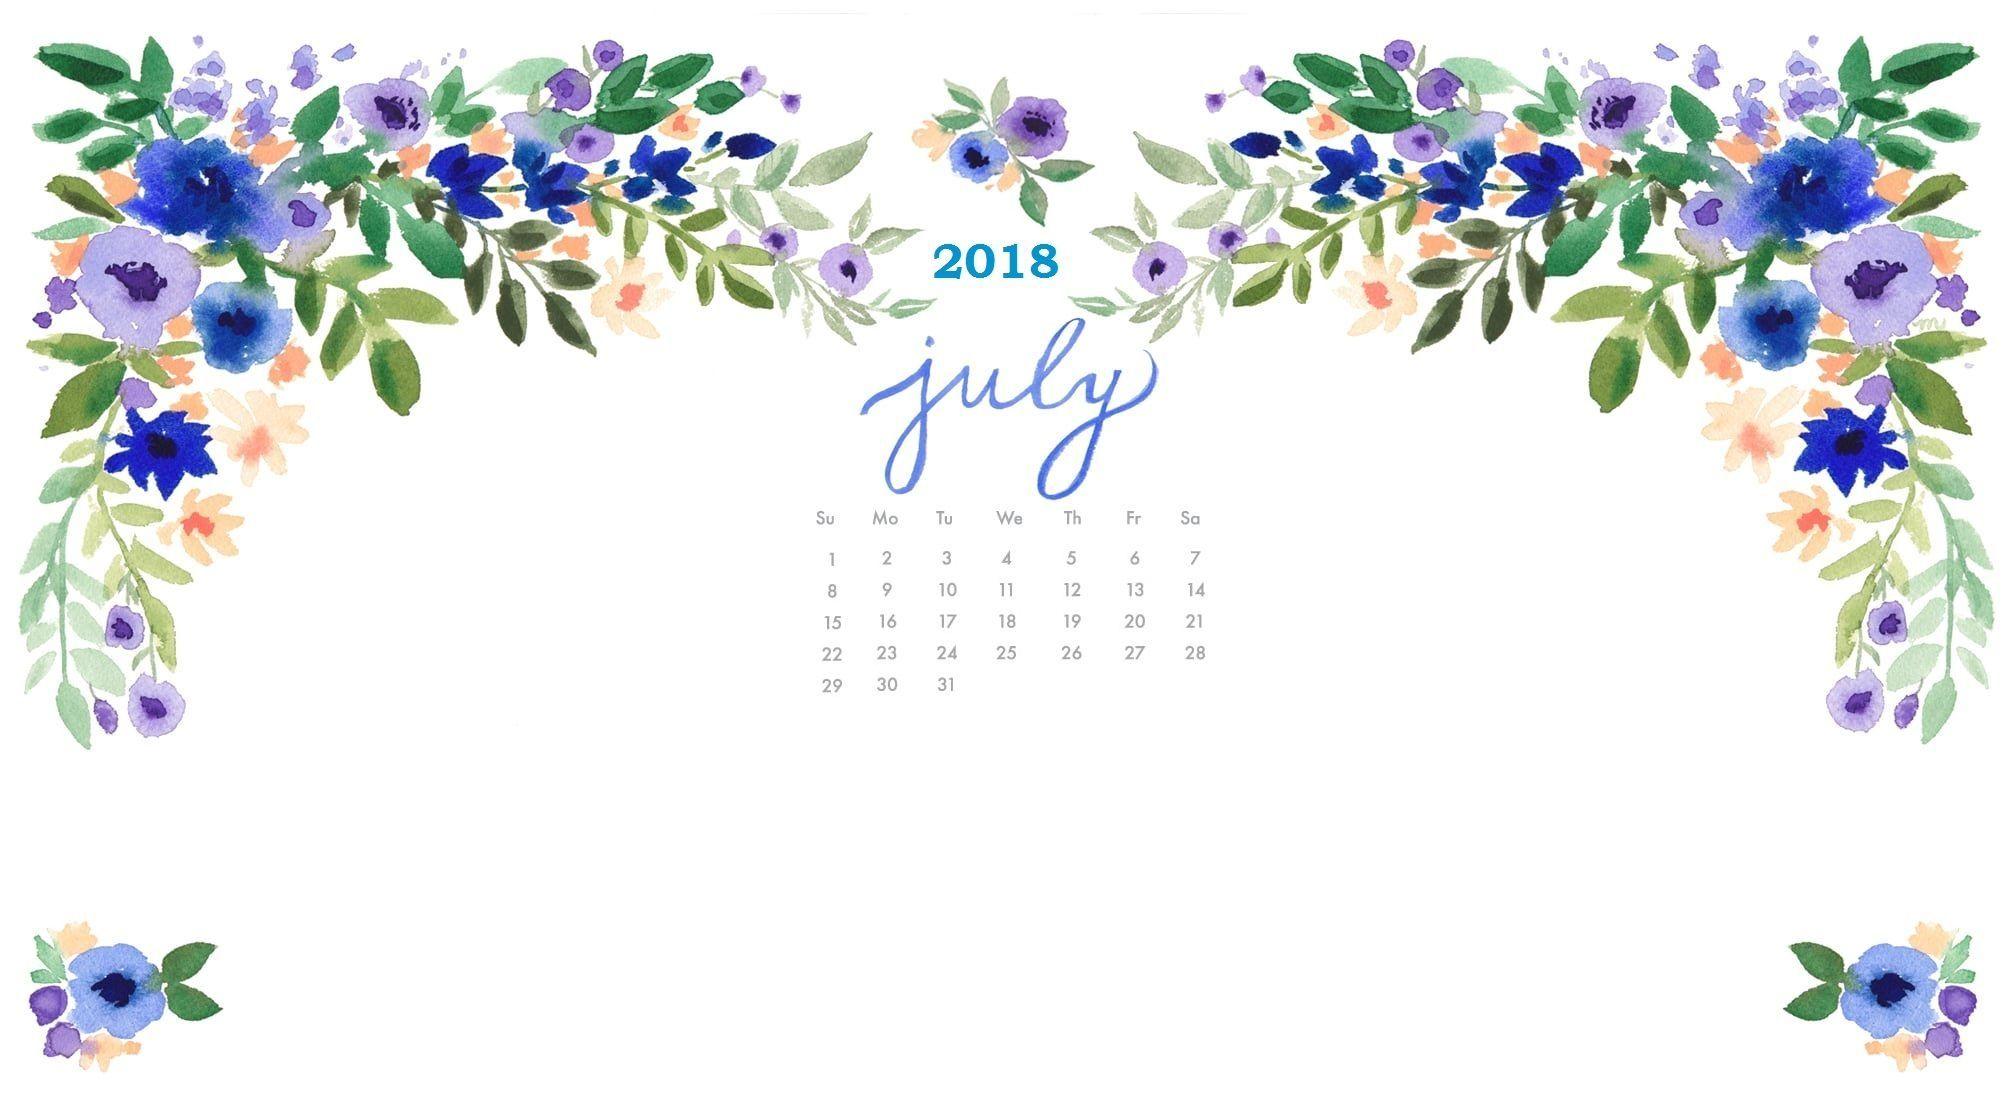 July 2019calendar Wallpapers Wallpaper Cave July 2019 Iphone Calendar Wallpaper Desktop Wallpaper Calendar Calendar Wallpaper Desktop Wallpaper